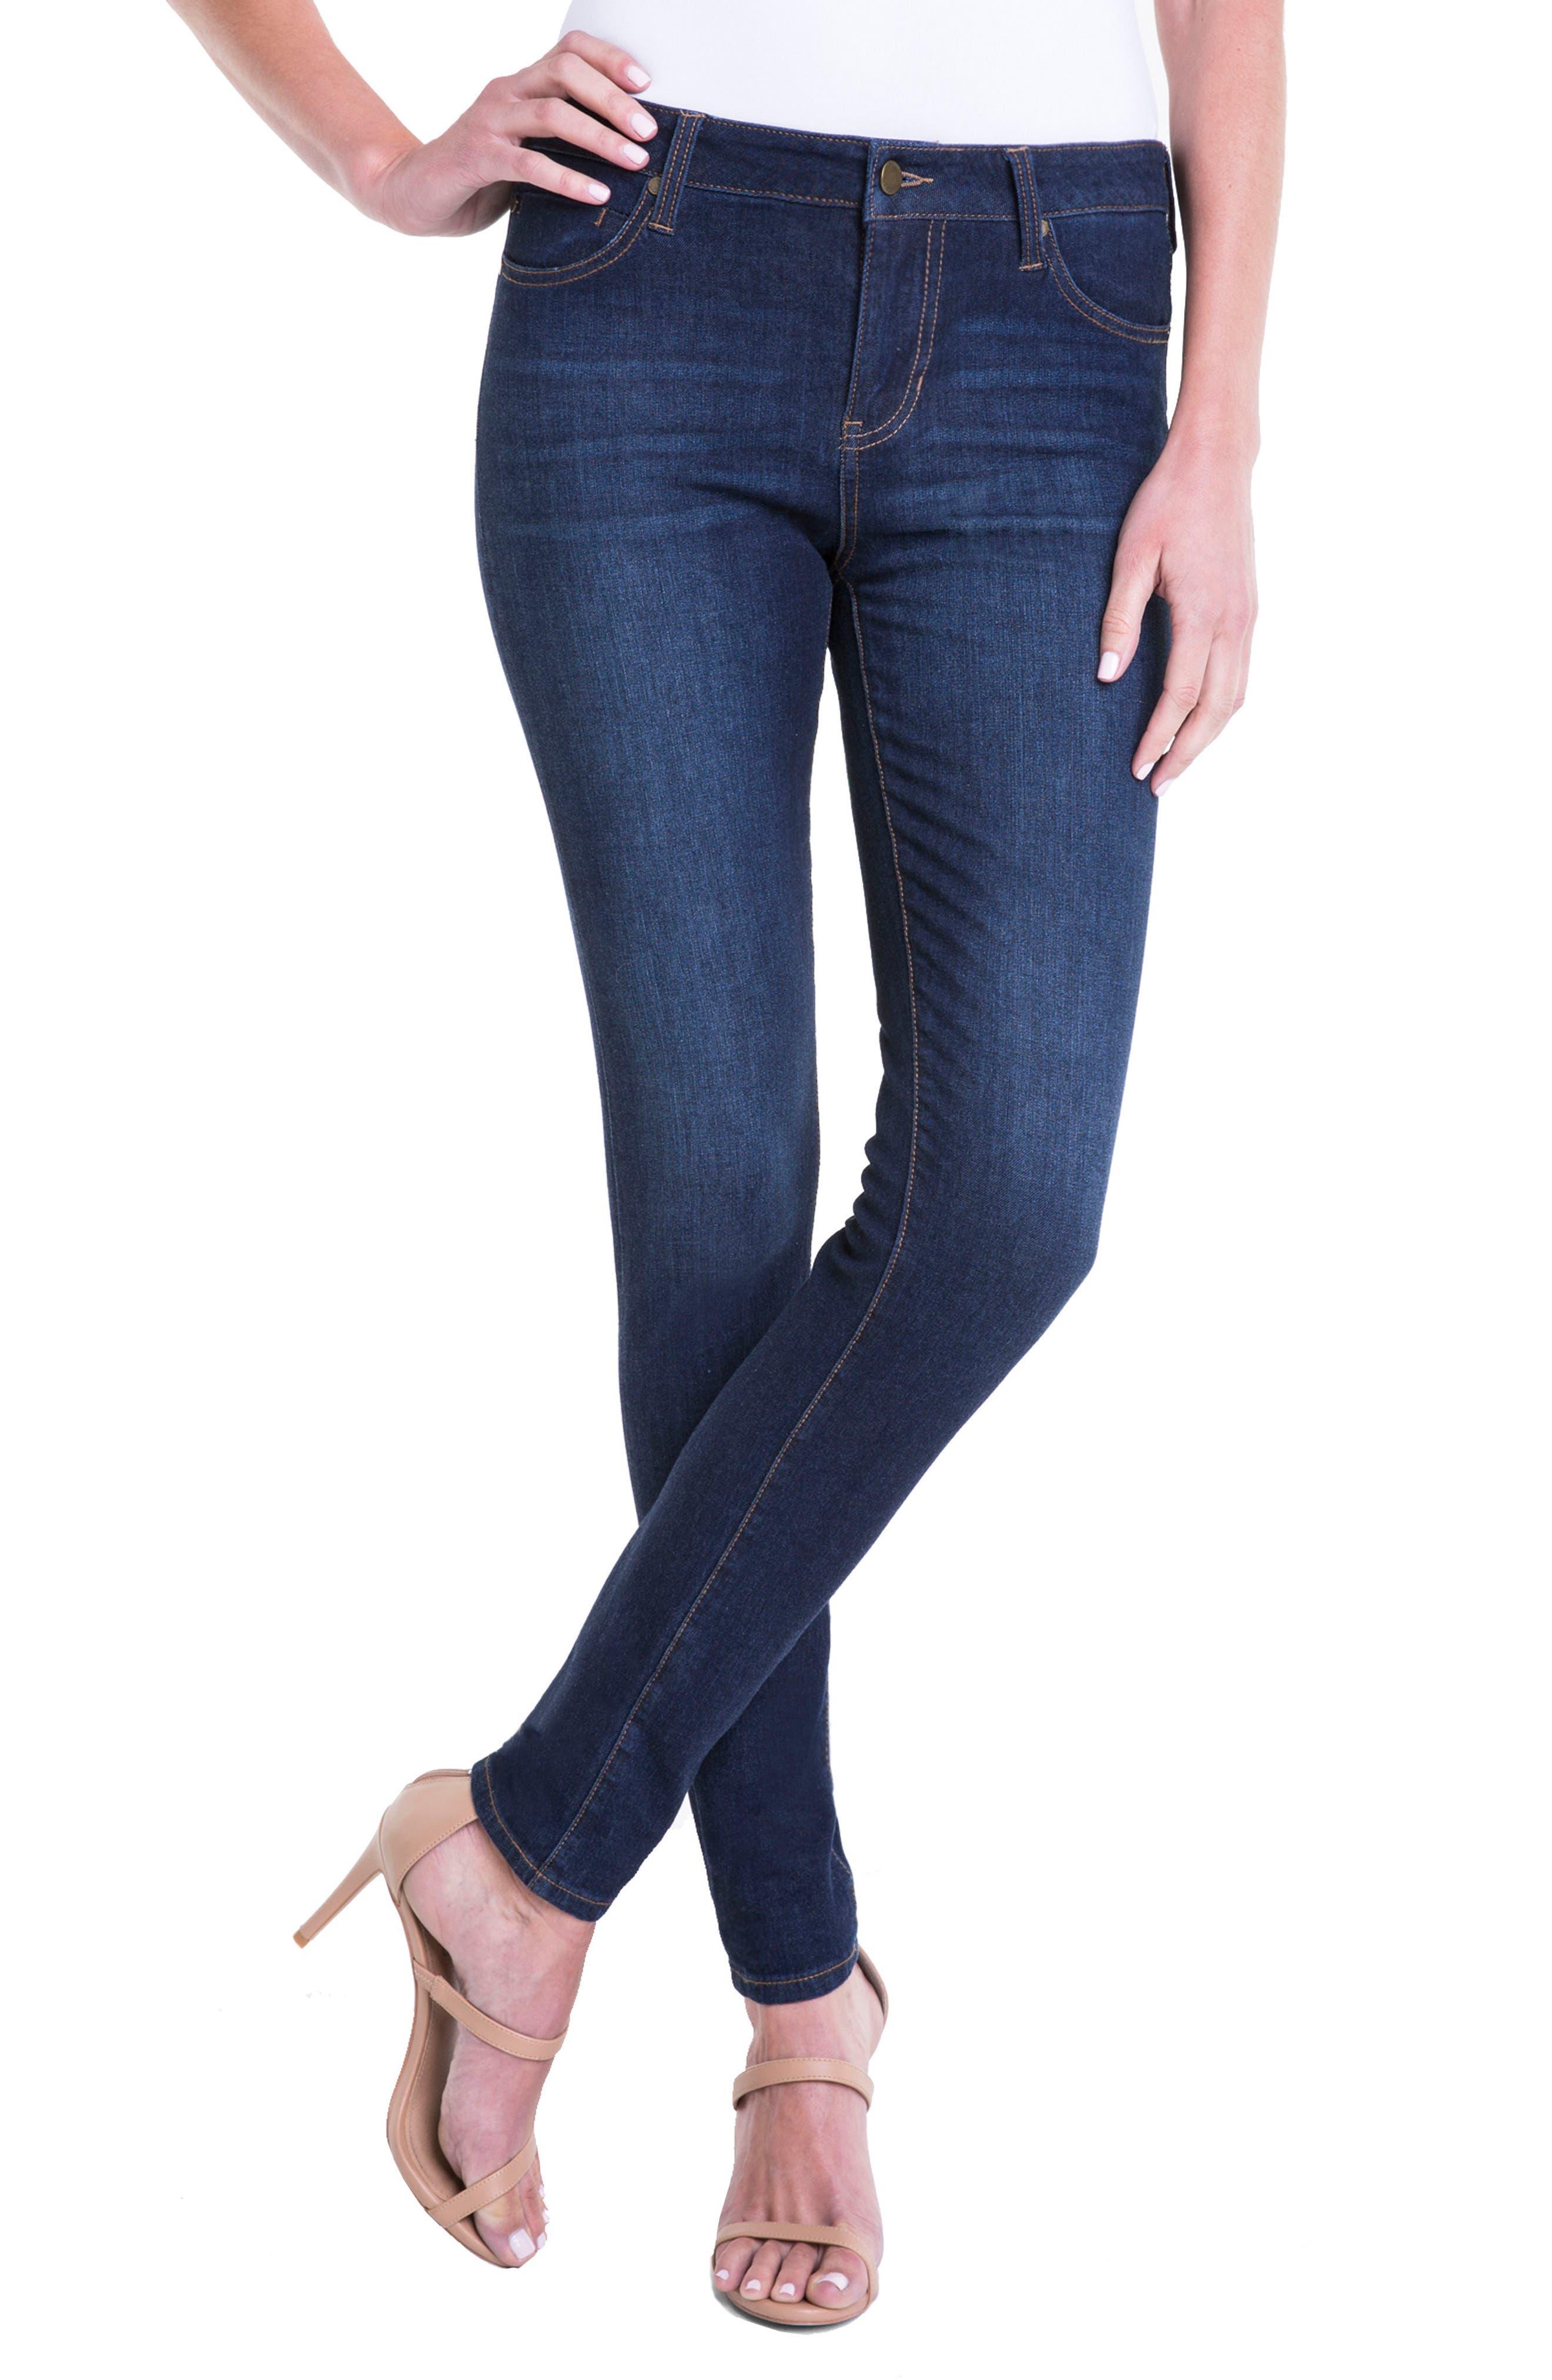 Liverpool Jeans Company 'Abby' Stretch Curvy Fit Skinny Jeans (Dark Blue)